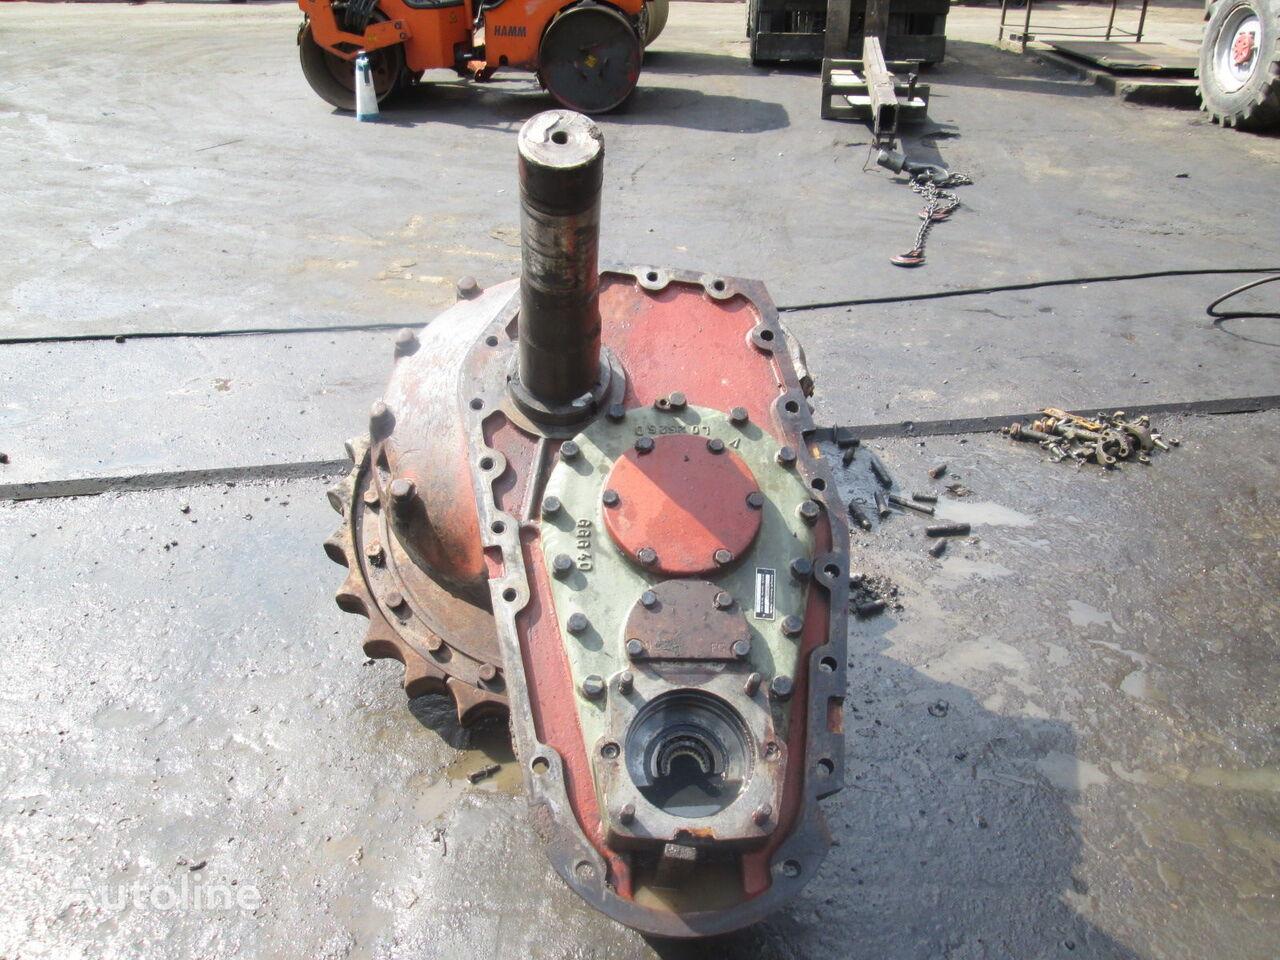 cap de acționare LIEBHERR 40 641 0000 00 010 pentru buldozer LIEBHERR PR741